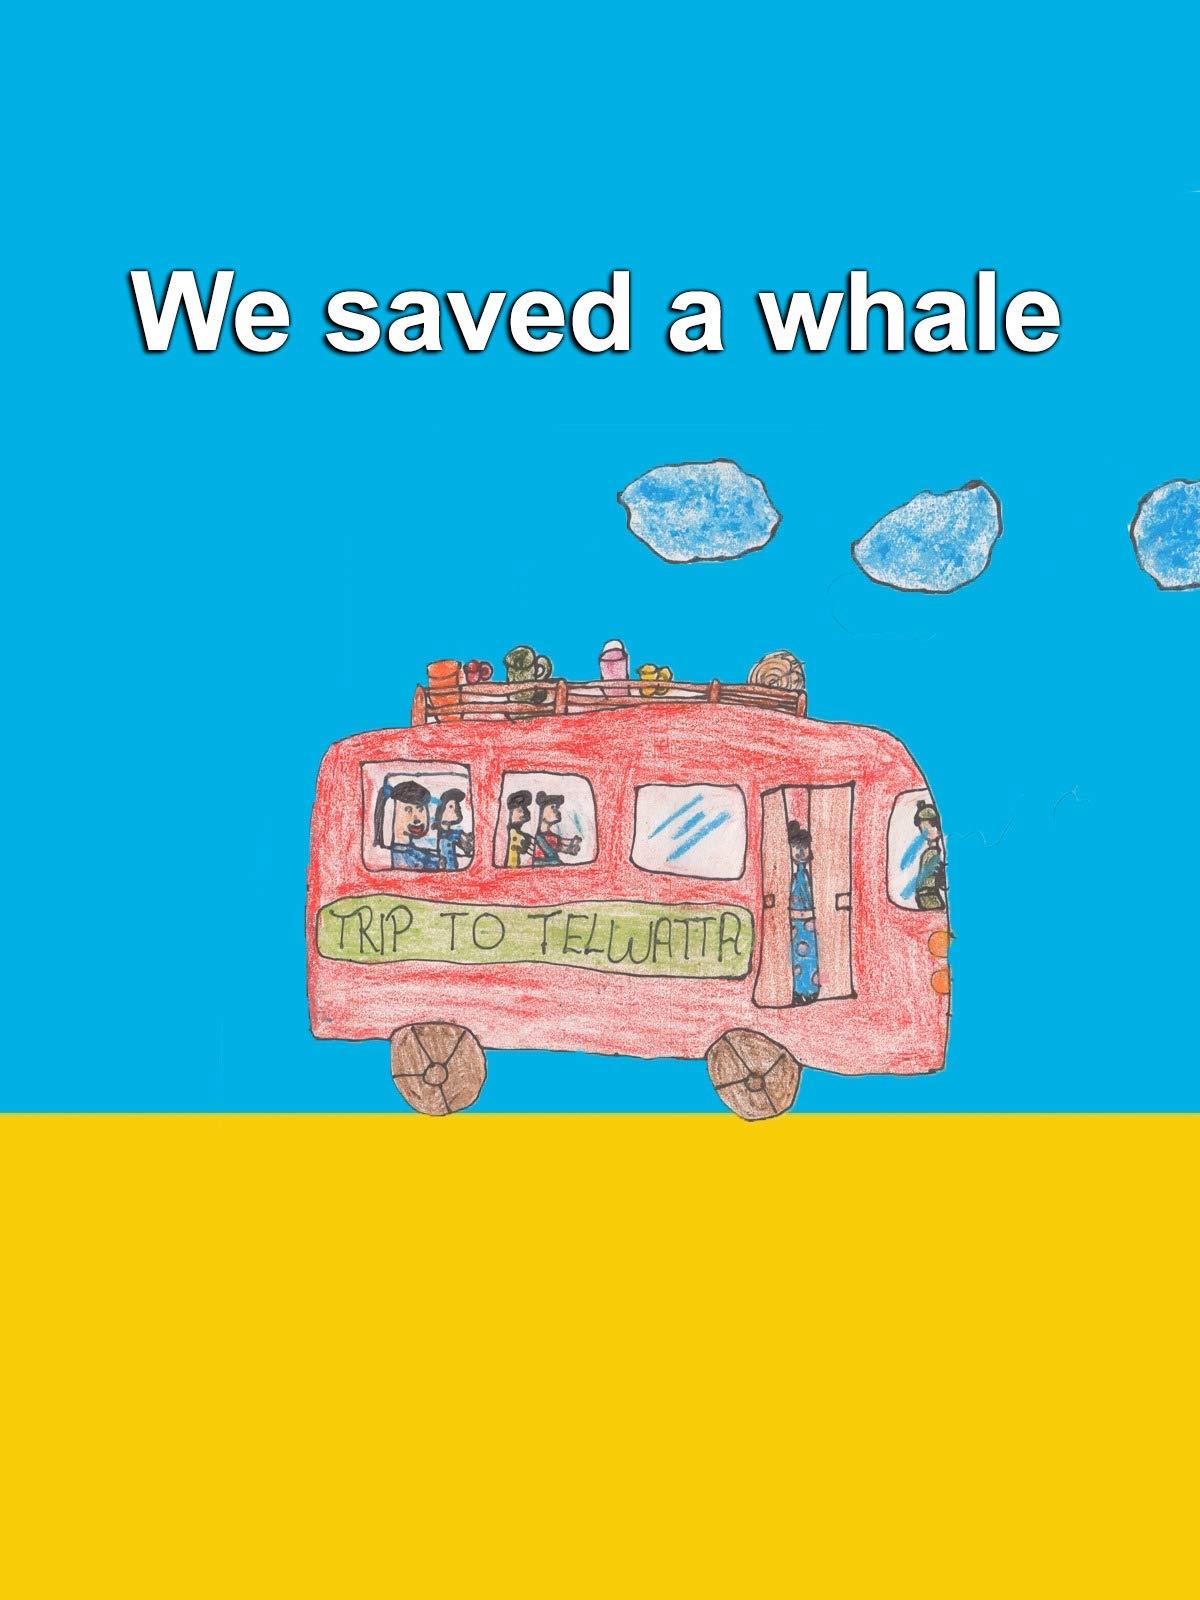 We saved a whale